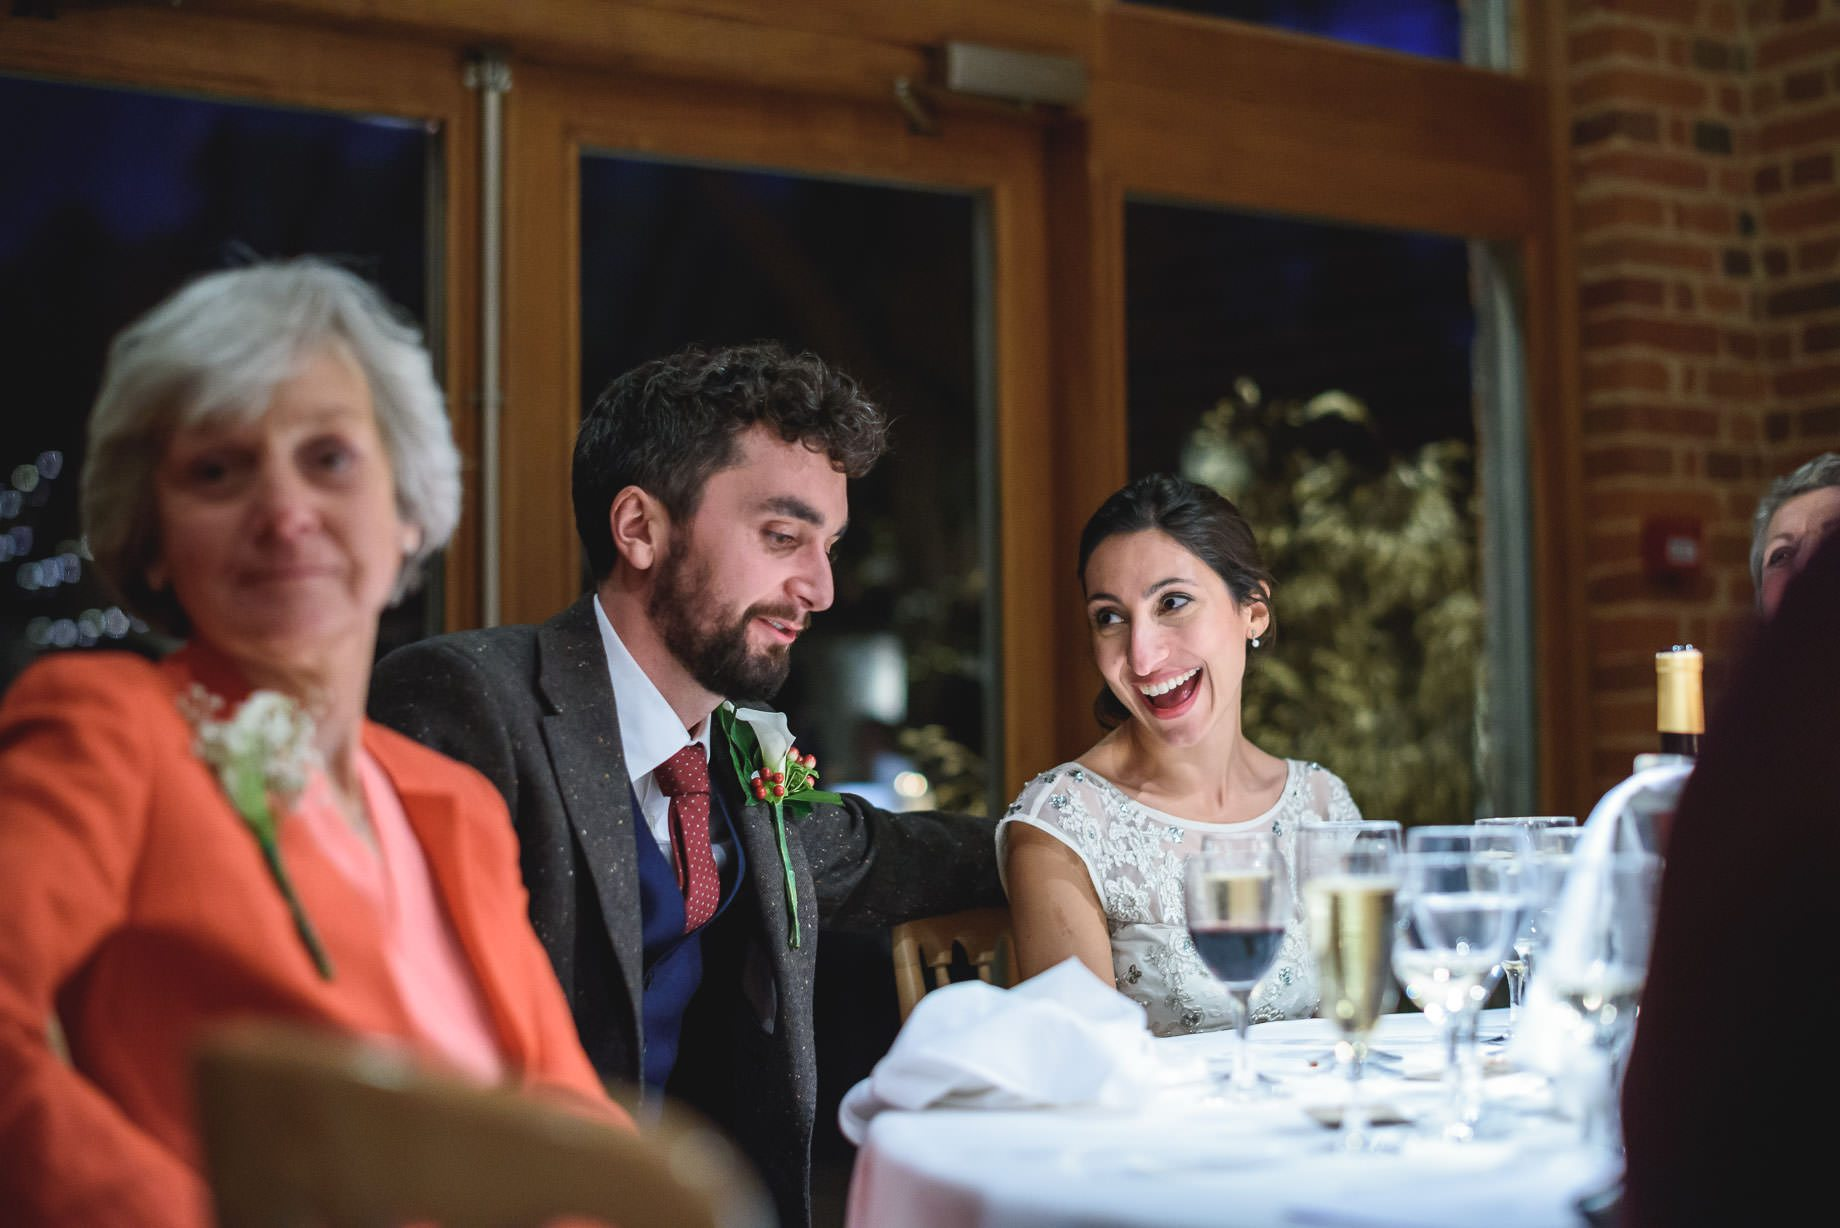 bury-court-barn-wedding-photography-guy-collier-photography-nadia-tom-145-of-184